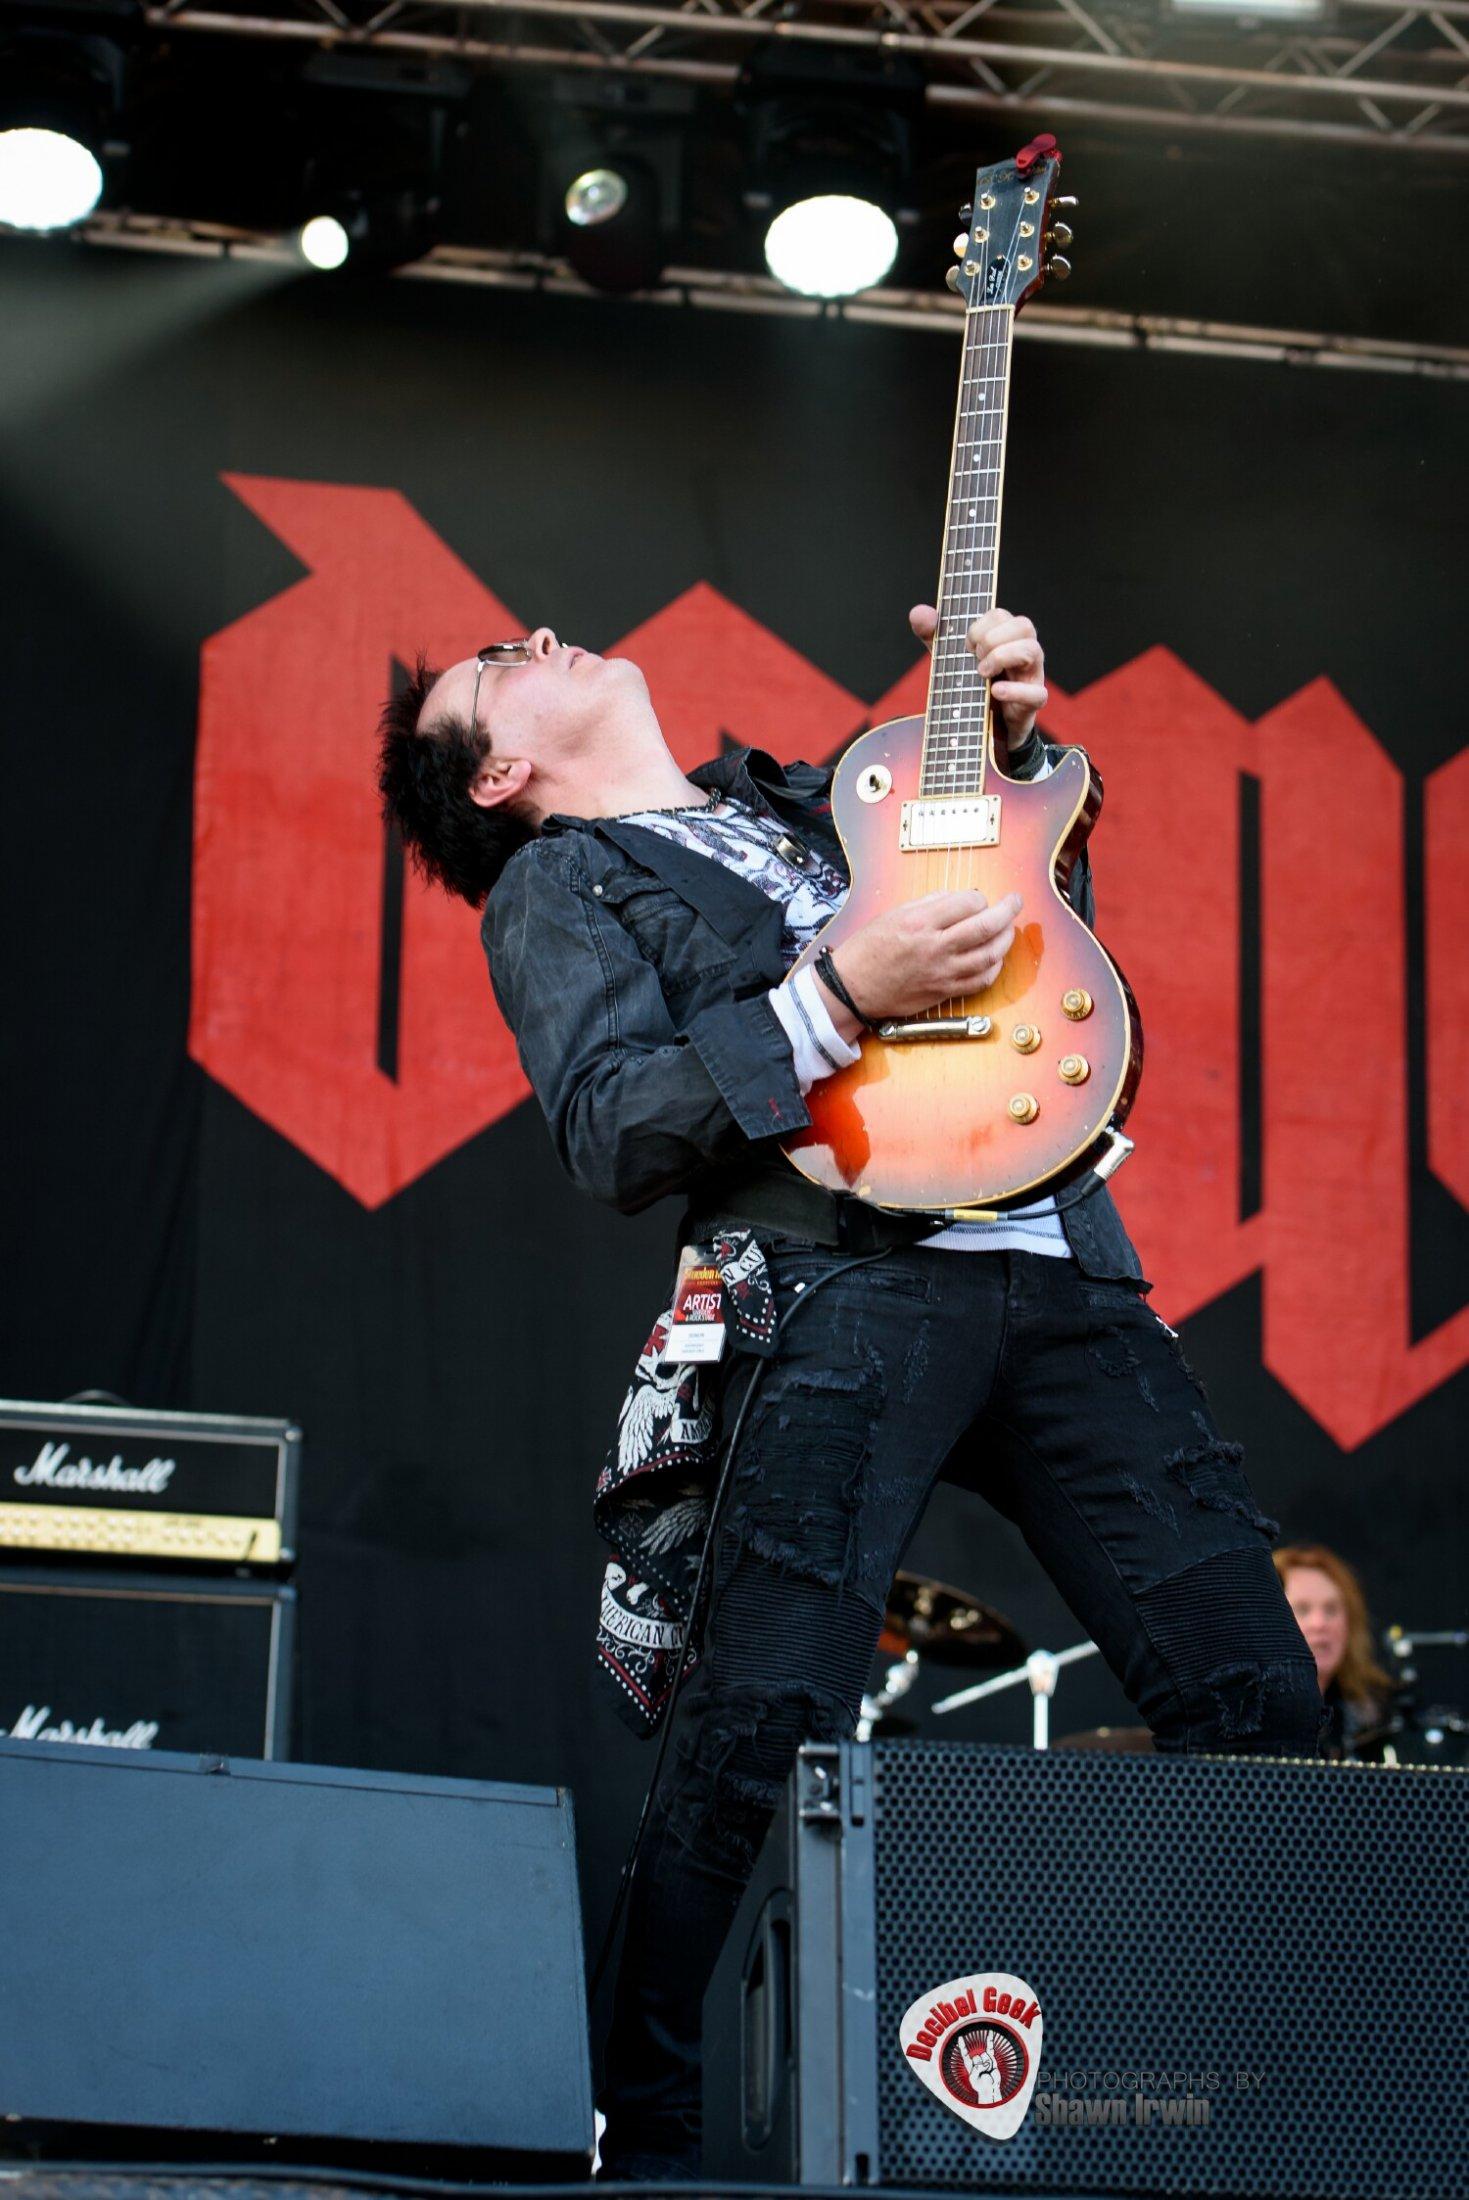 Demon #47-Sweden Rock 2019-Shawn Irwin